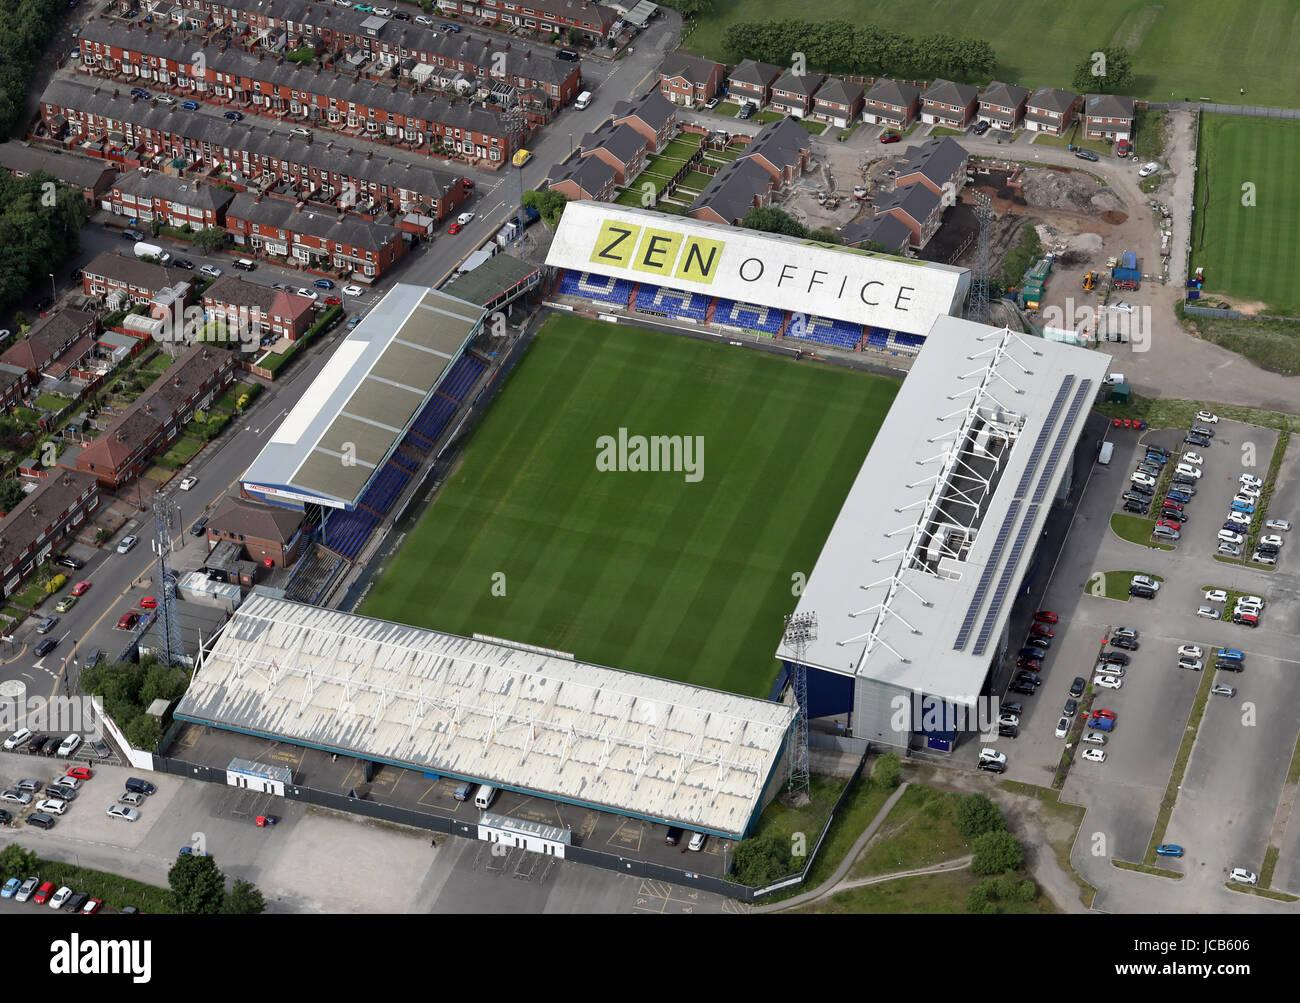 Luftaufnahme von Oldham Athletic Boundary Park Stadion Fußballplatz, UK Stockbild